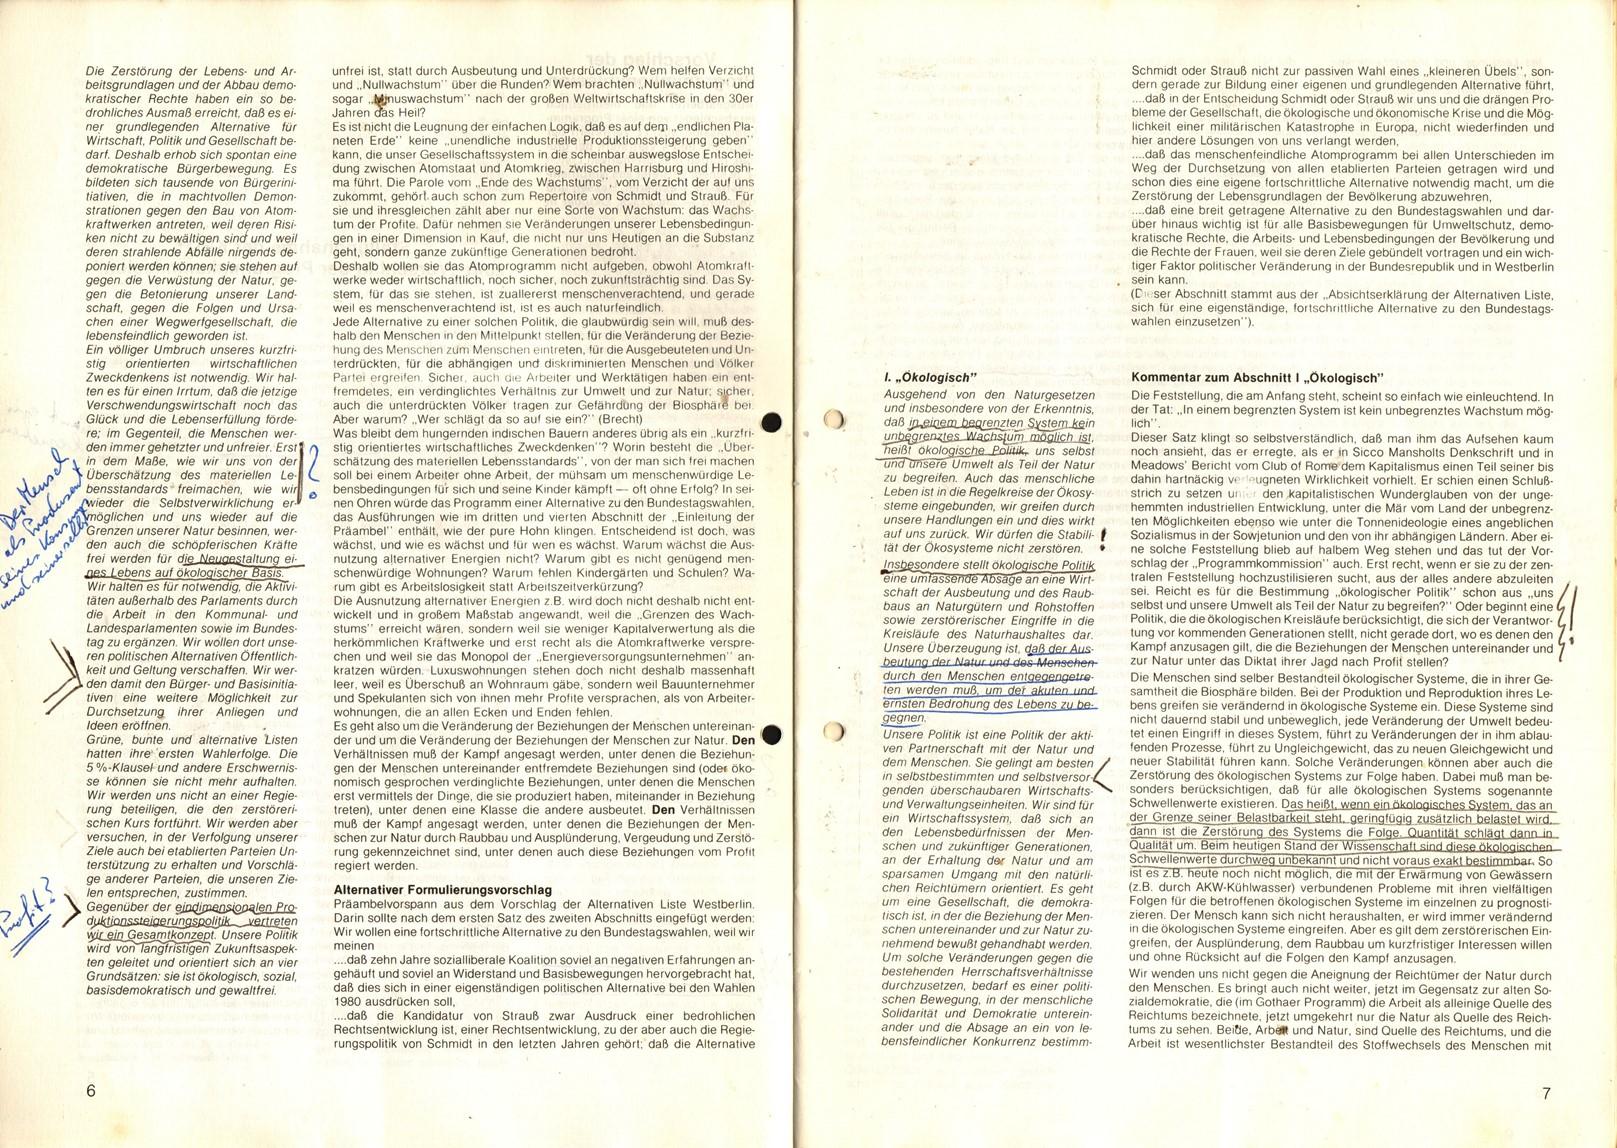 KPDAO_1979_Diskussion_Bundestagswahlen_1980_04